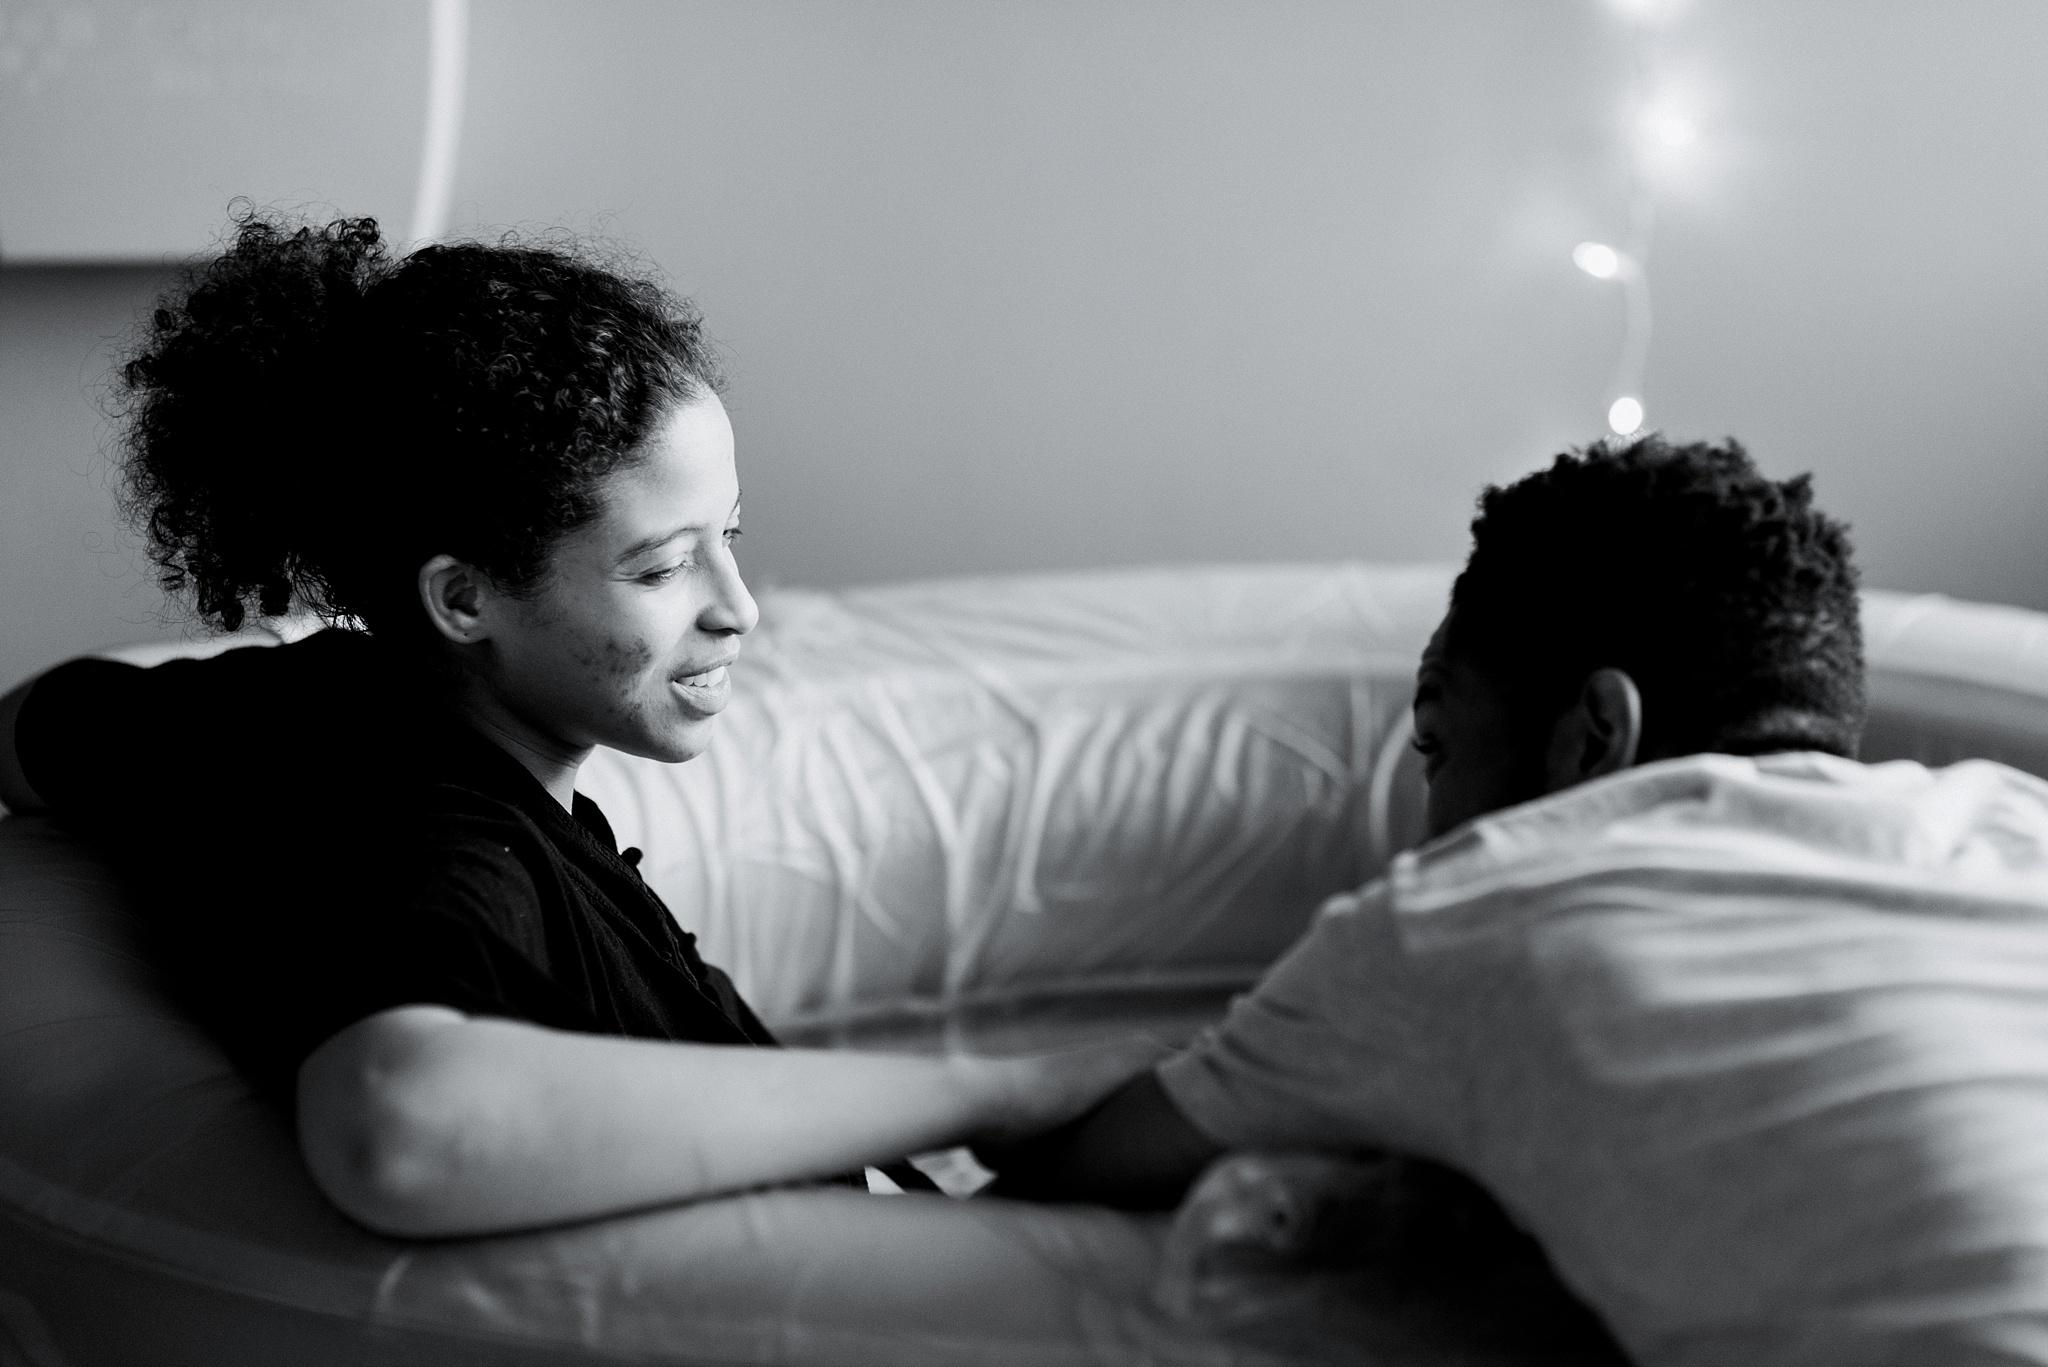 atlanta-medical-center-birth-photographer-nykole-smith-199.jpg